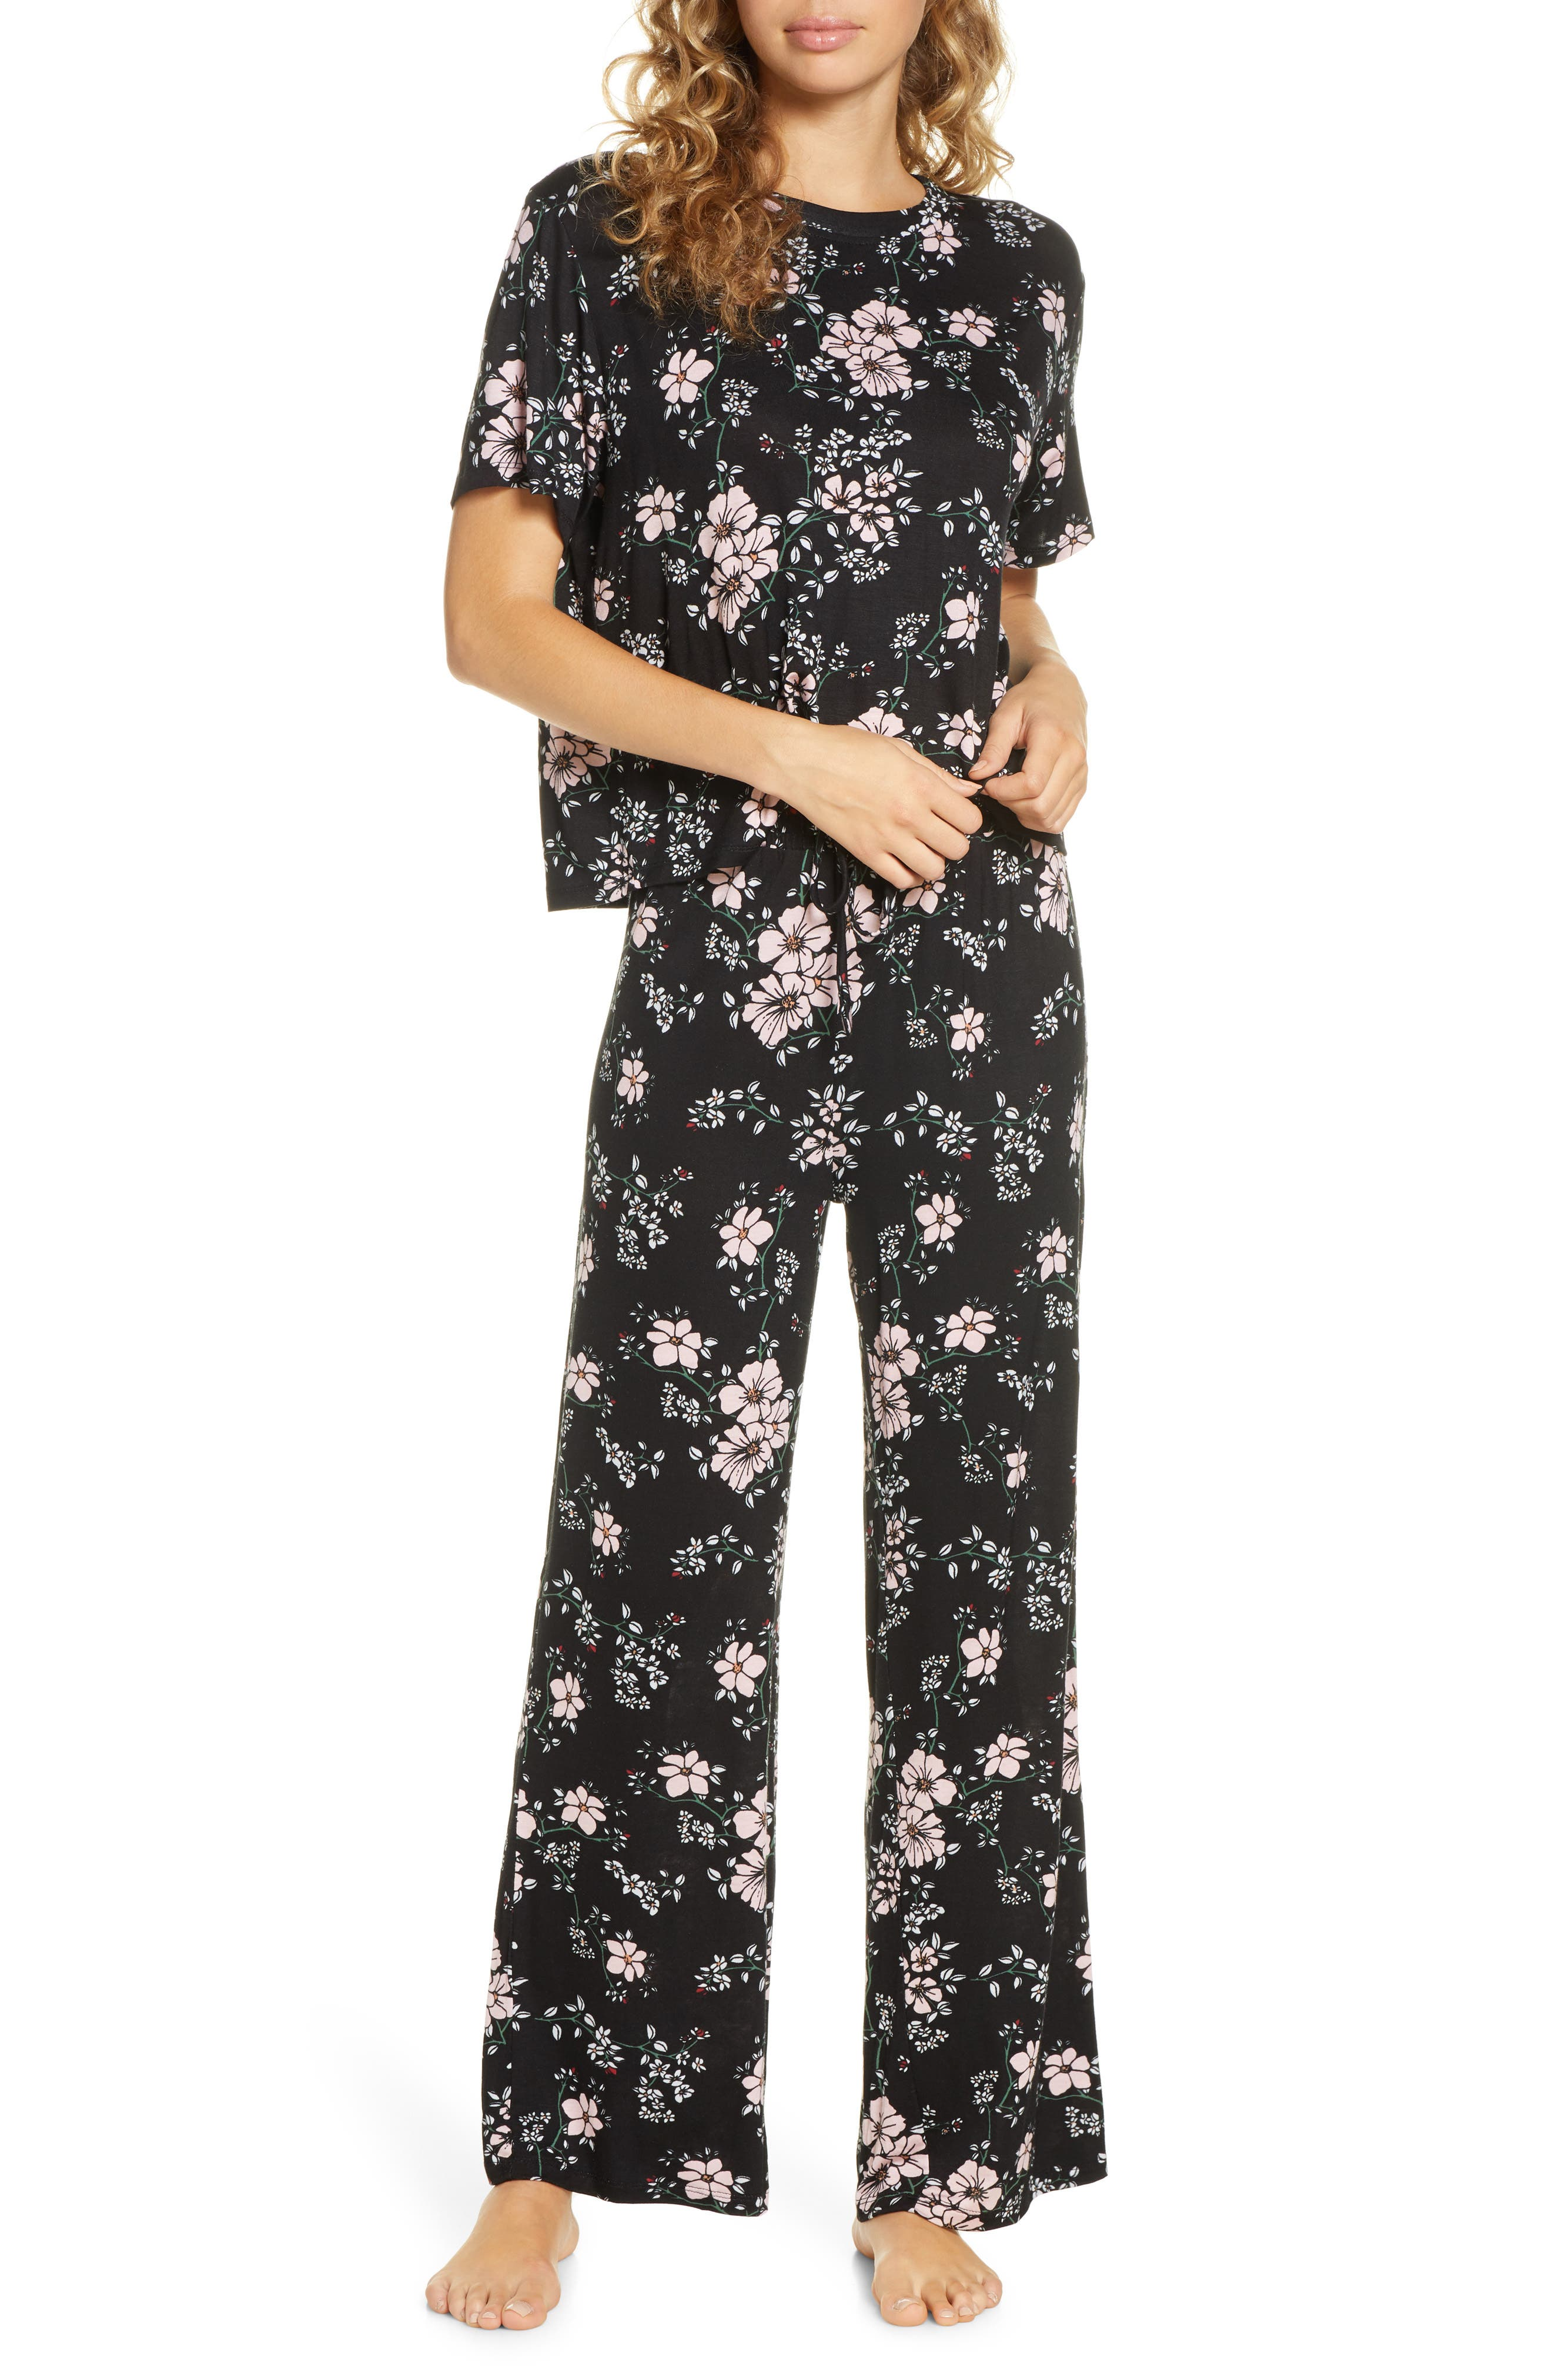 Honeydew Inimtates All American Pajamas